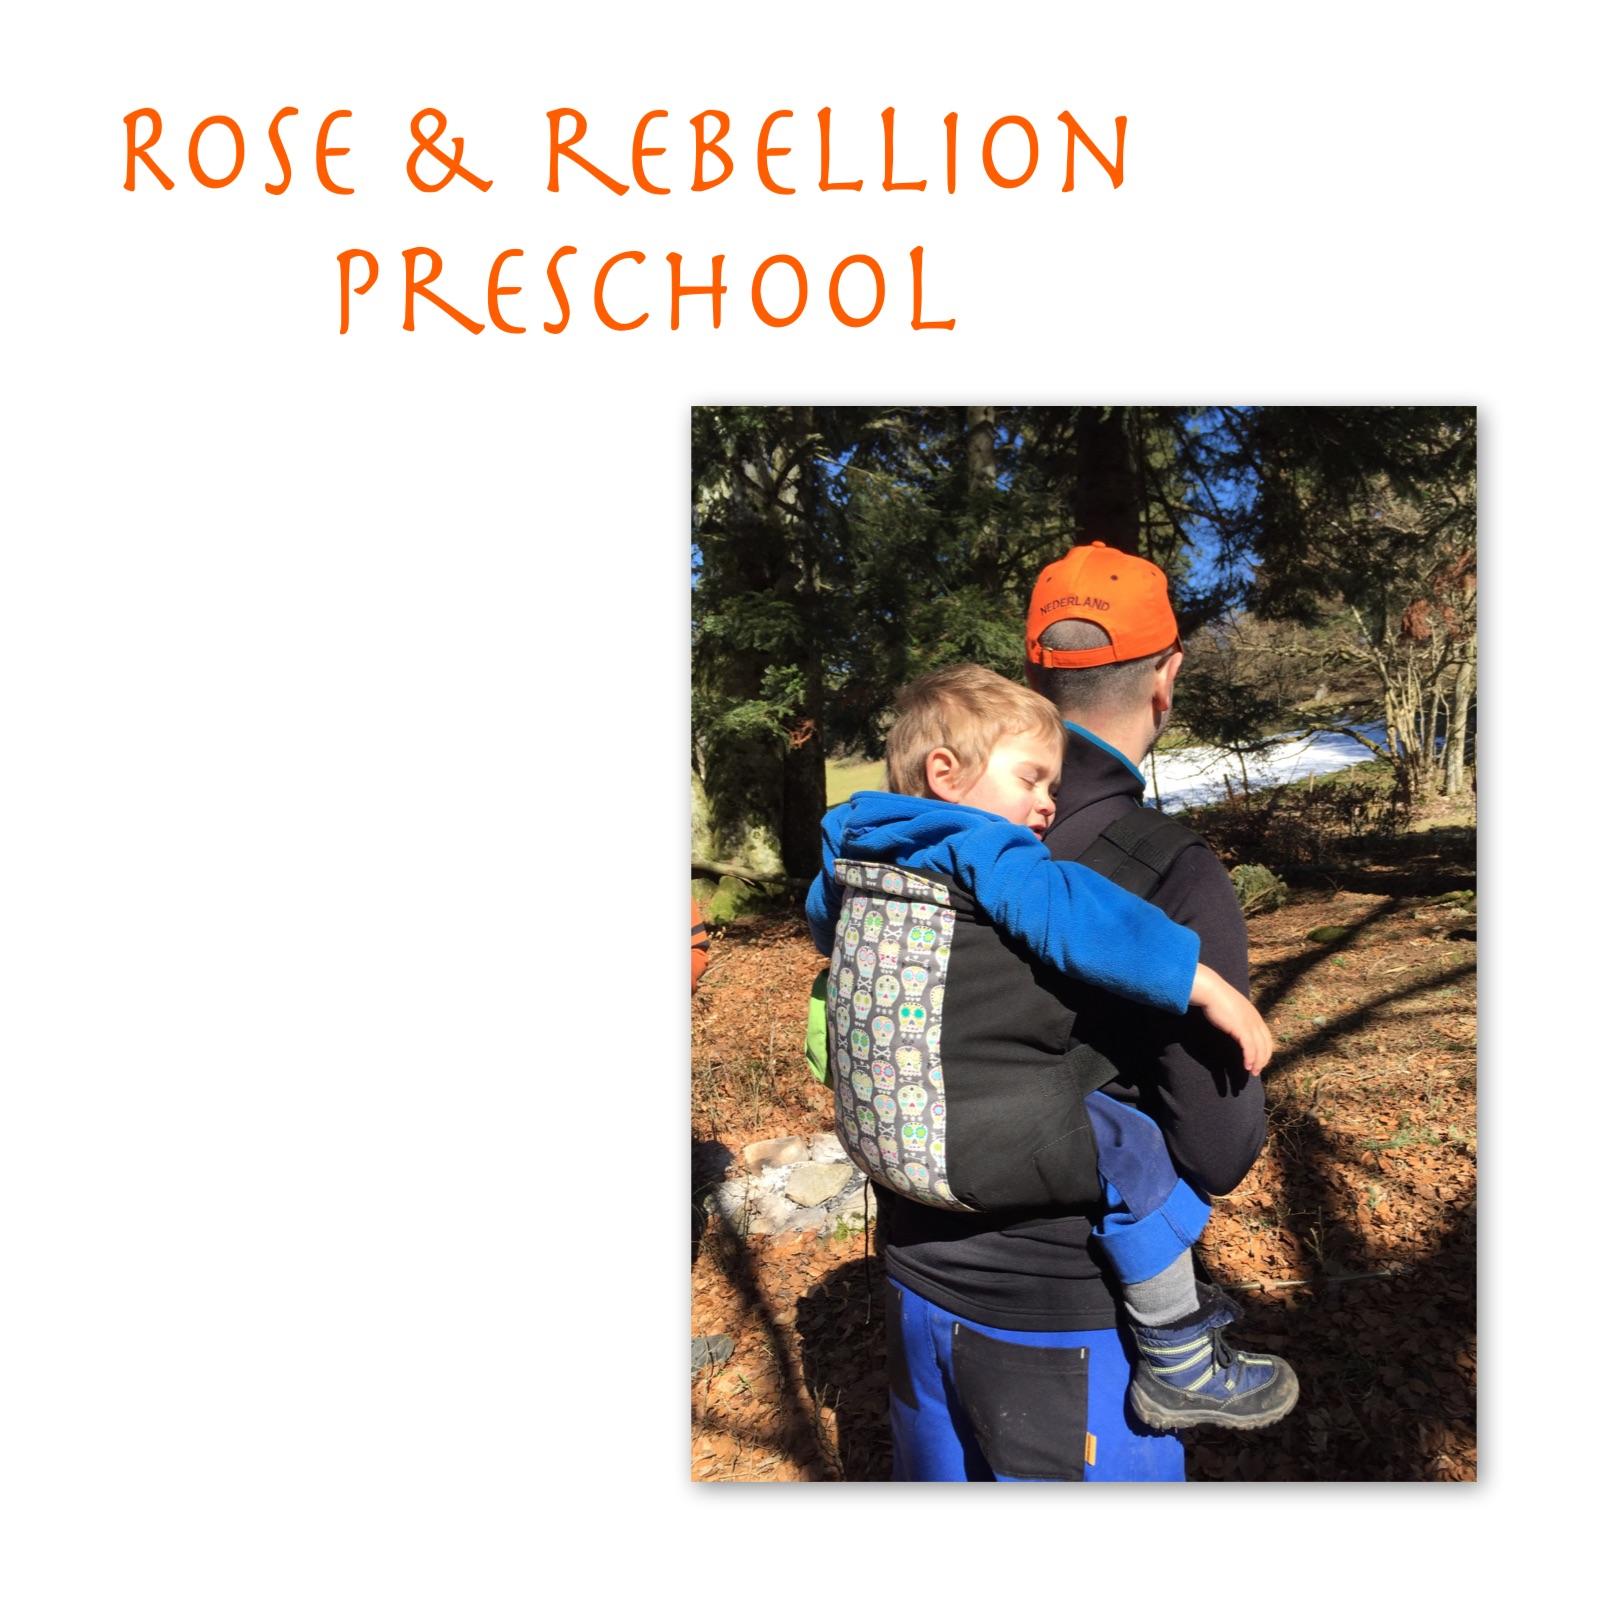 Rose & Rebellion preschool